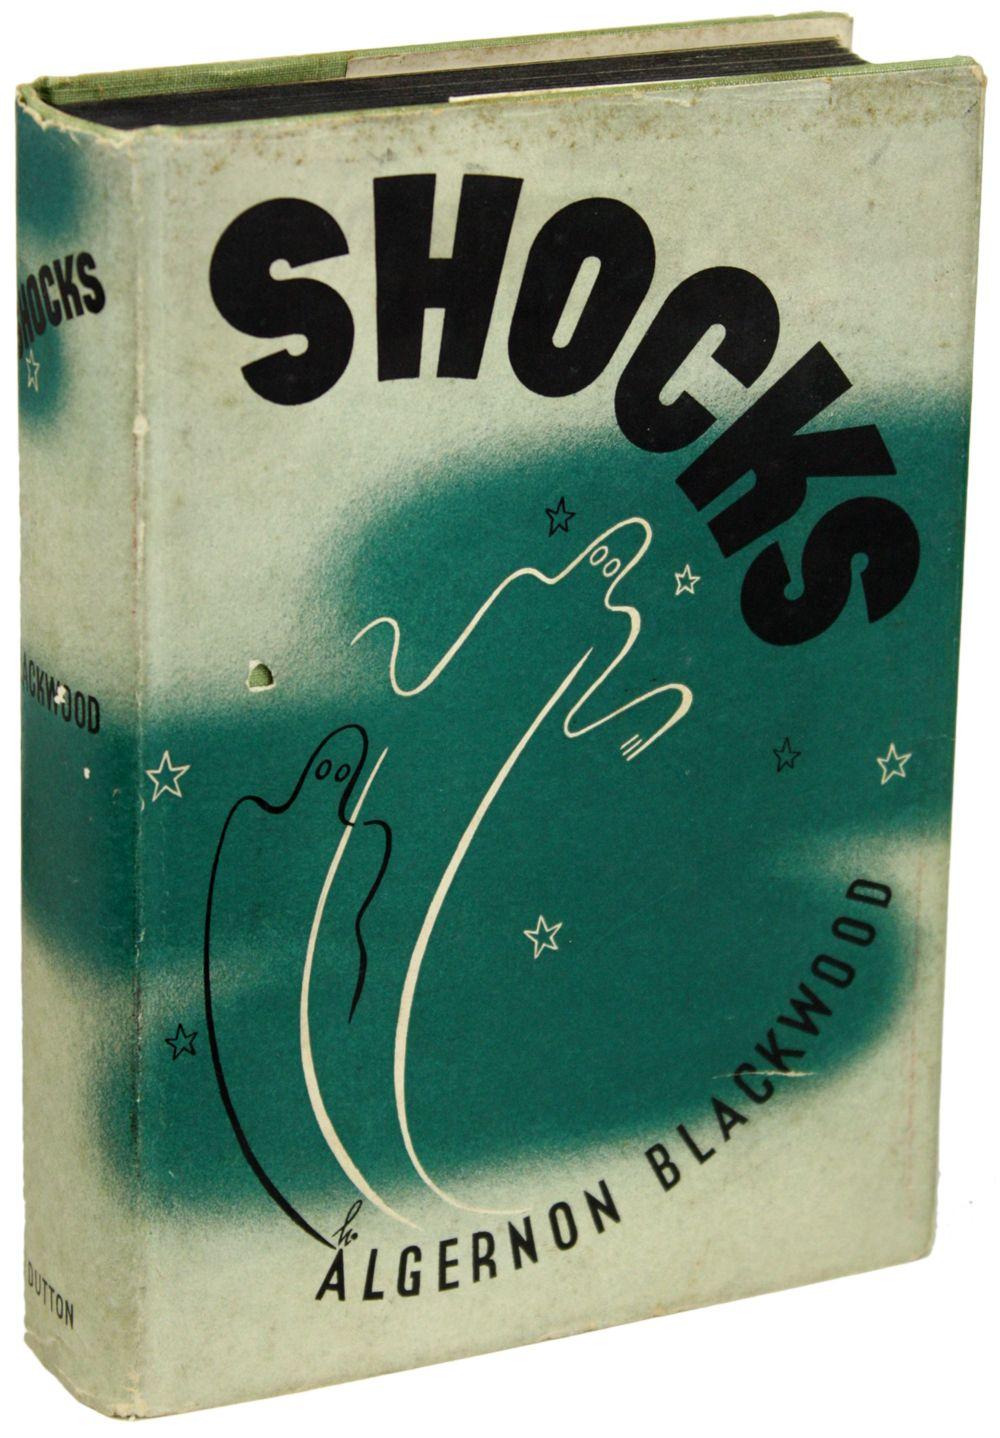 SHOCKS | Algernon Blackwood | First U.S. edition